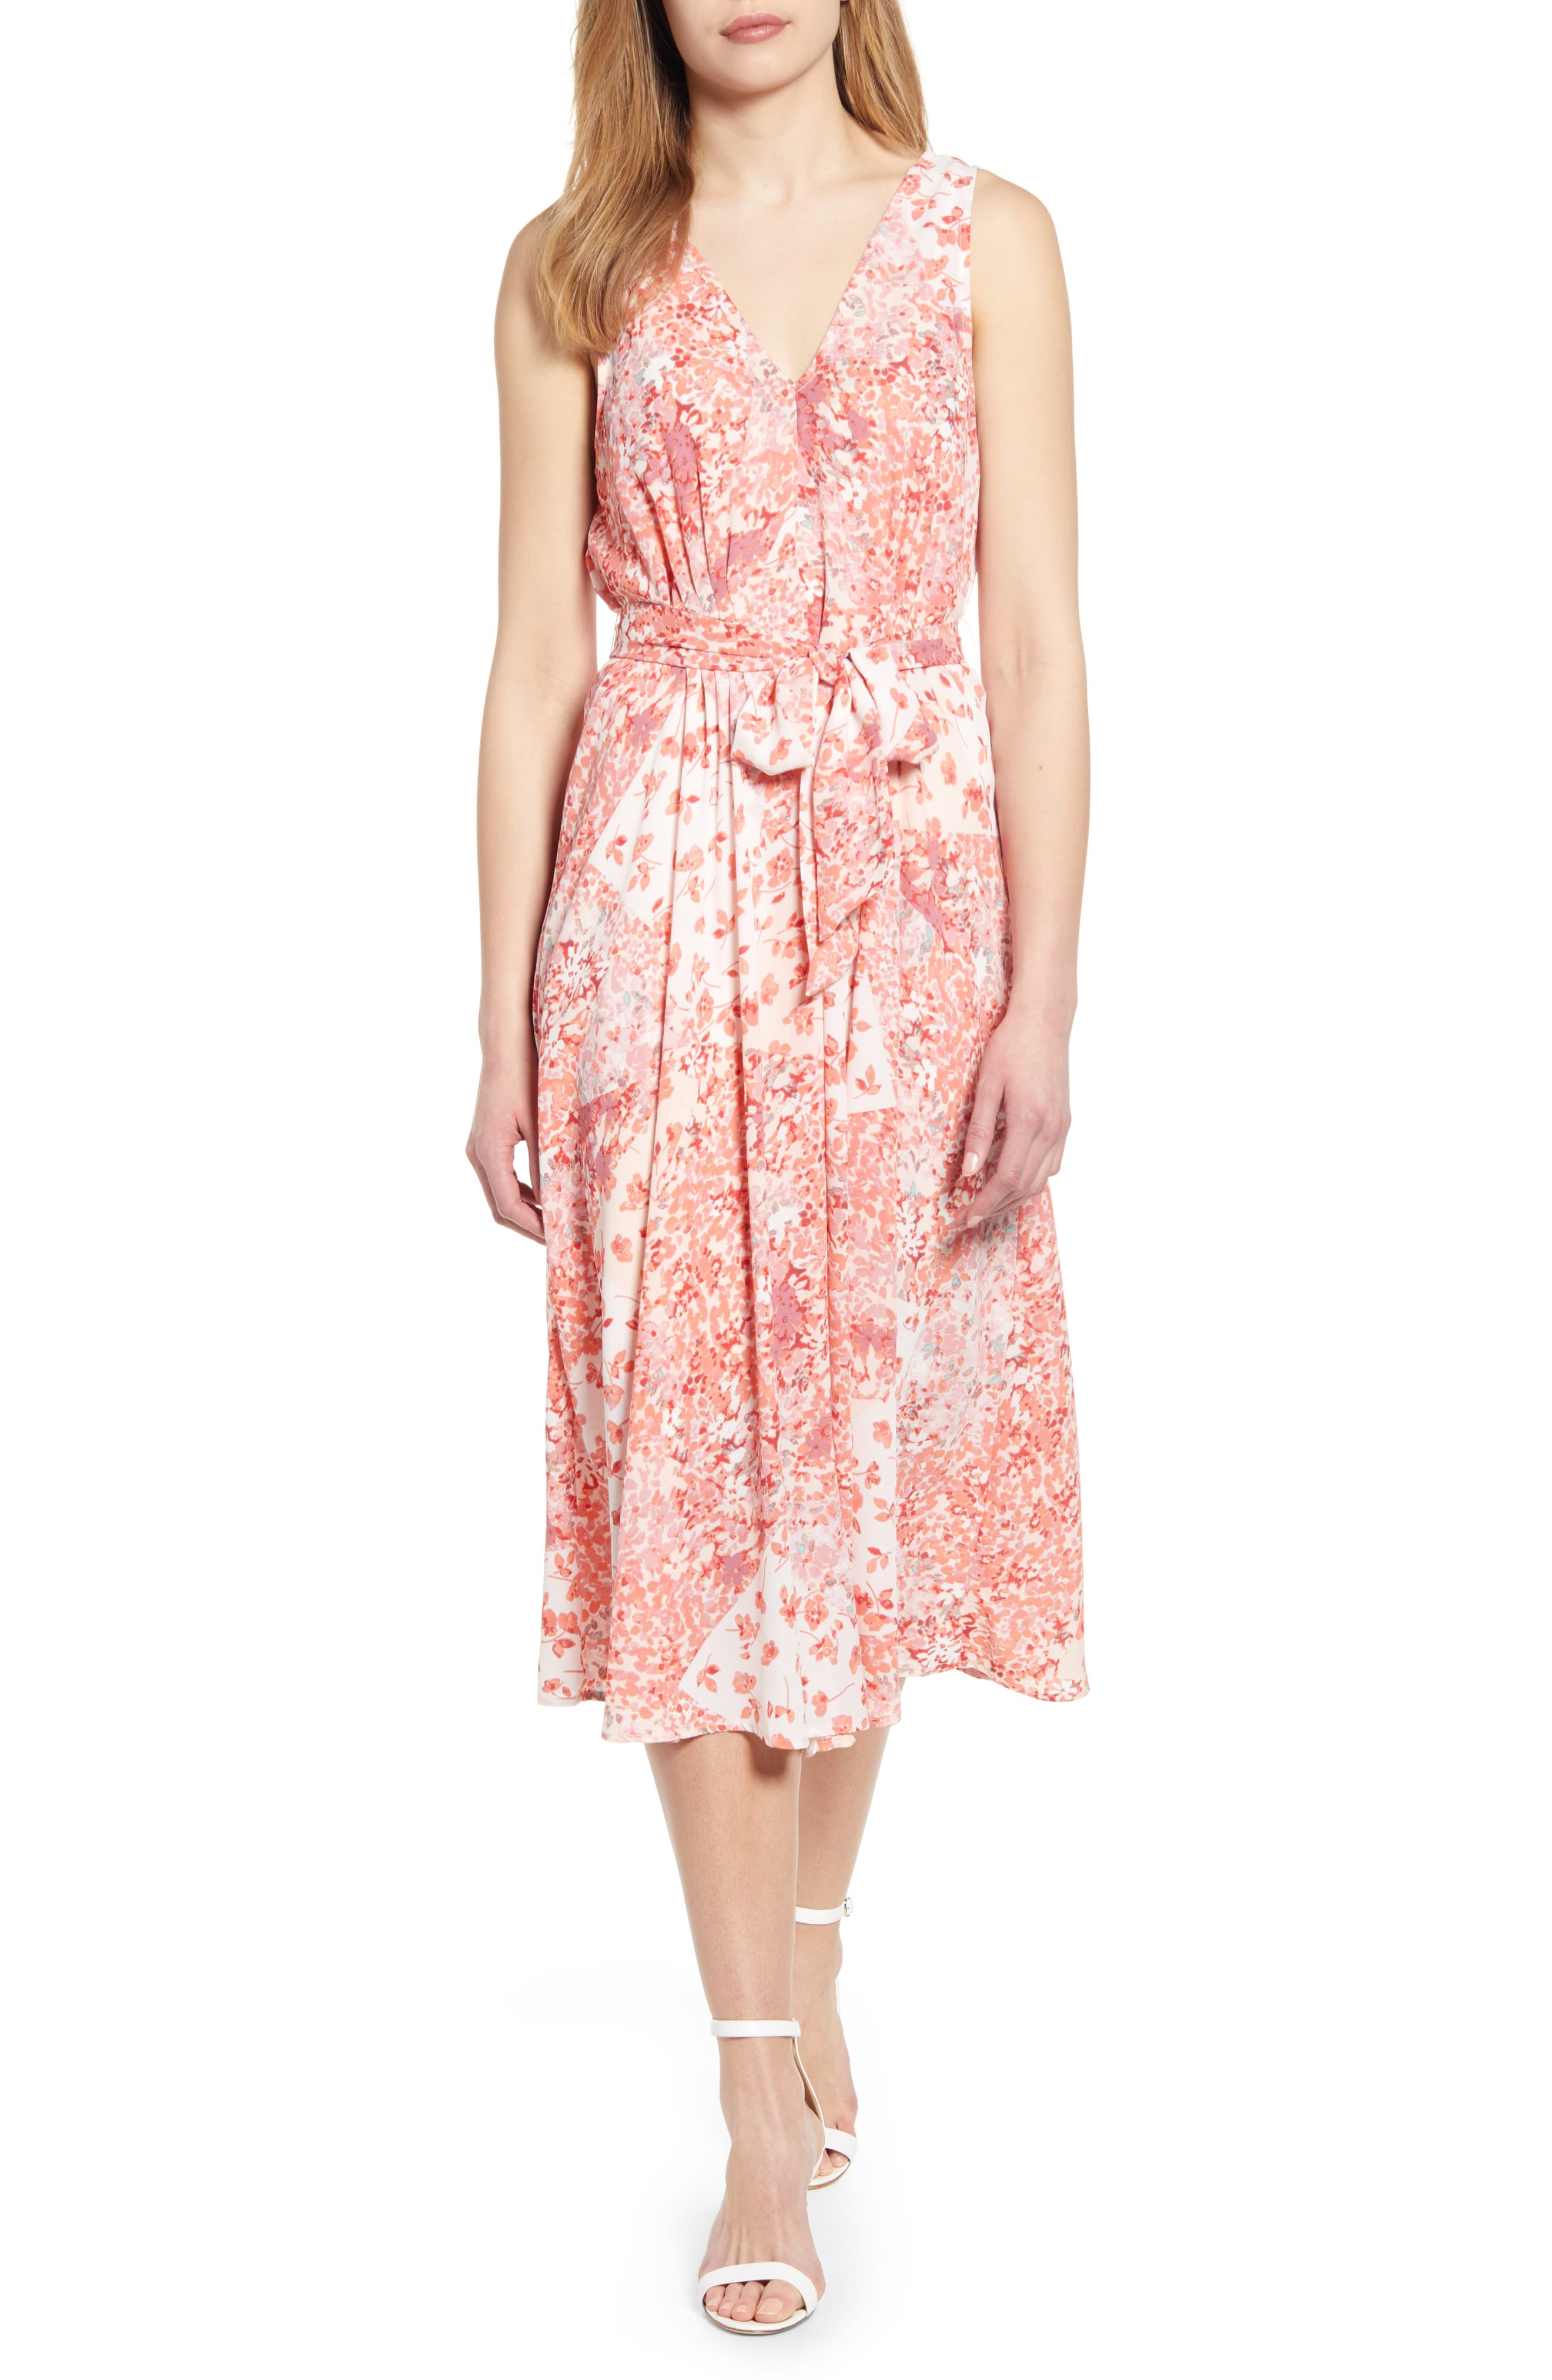 7ebb29560b2bf3 Tommy Hilfiger Tommy x Zendaya Halter Neck Drape Midi Dress in 2019 |  Products | Dresses, Nordstrom dresses, Halter neck